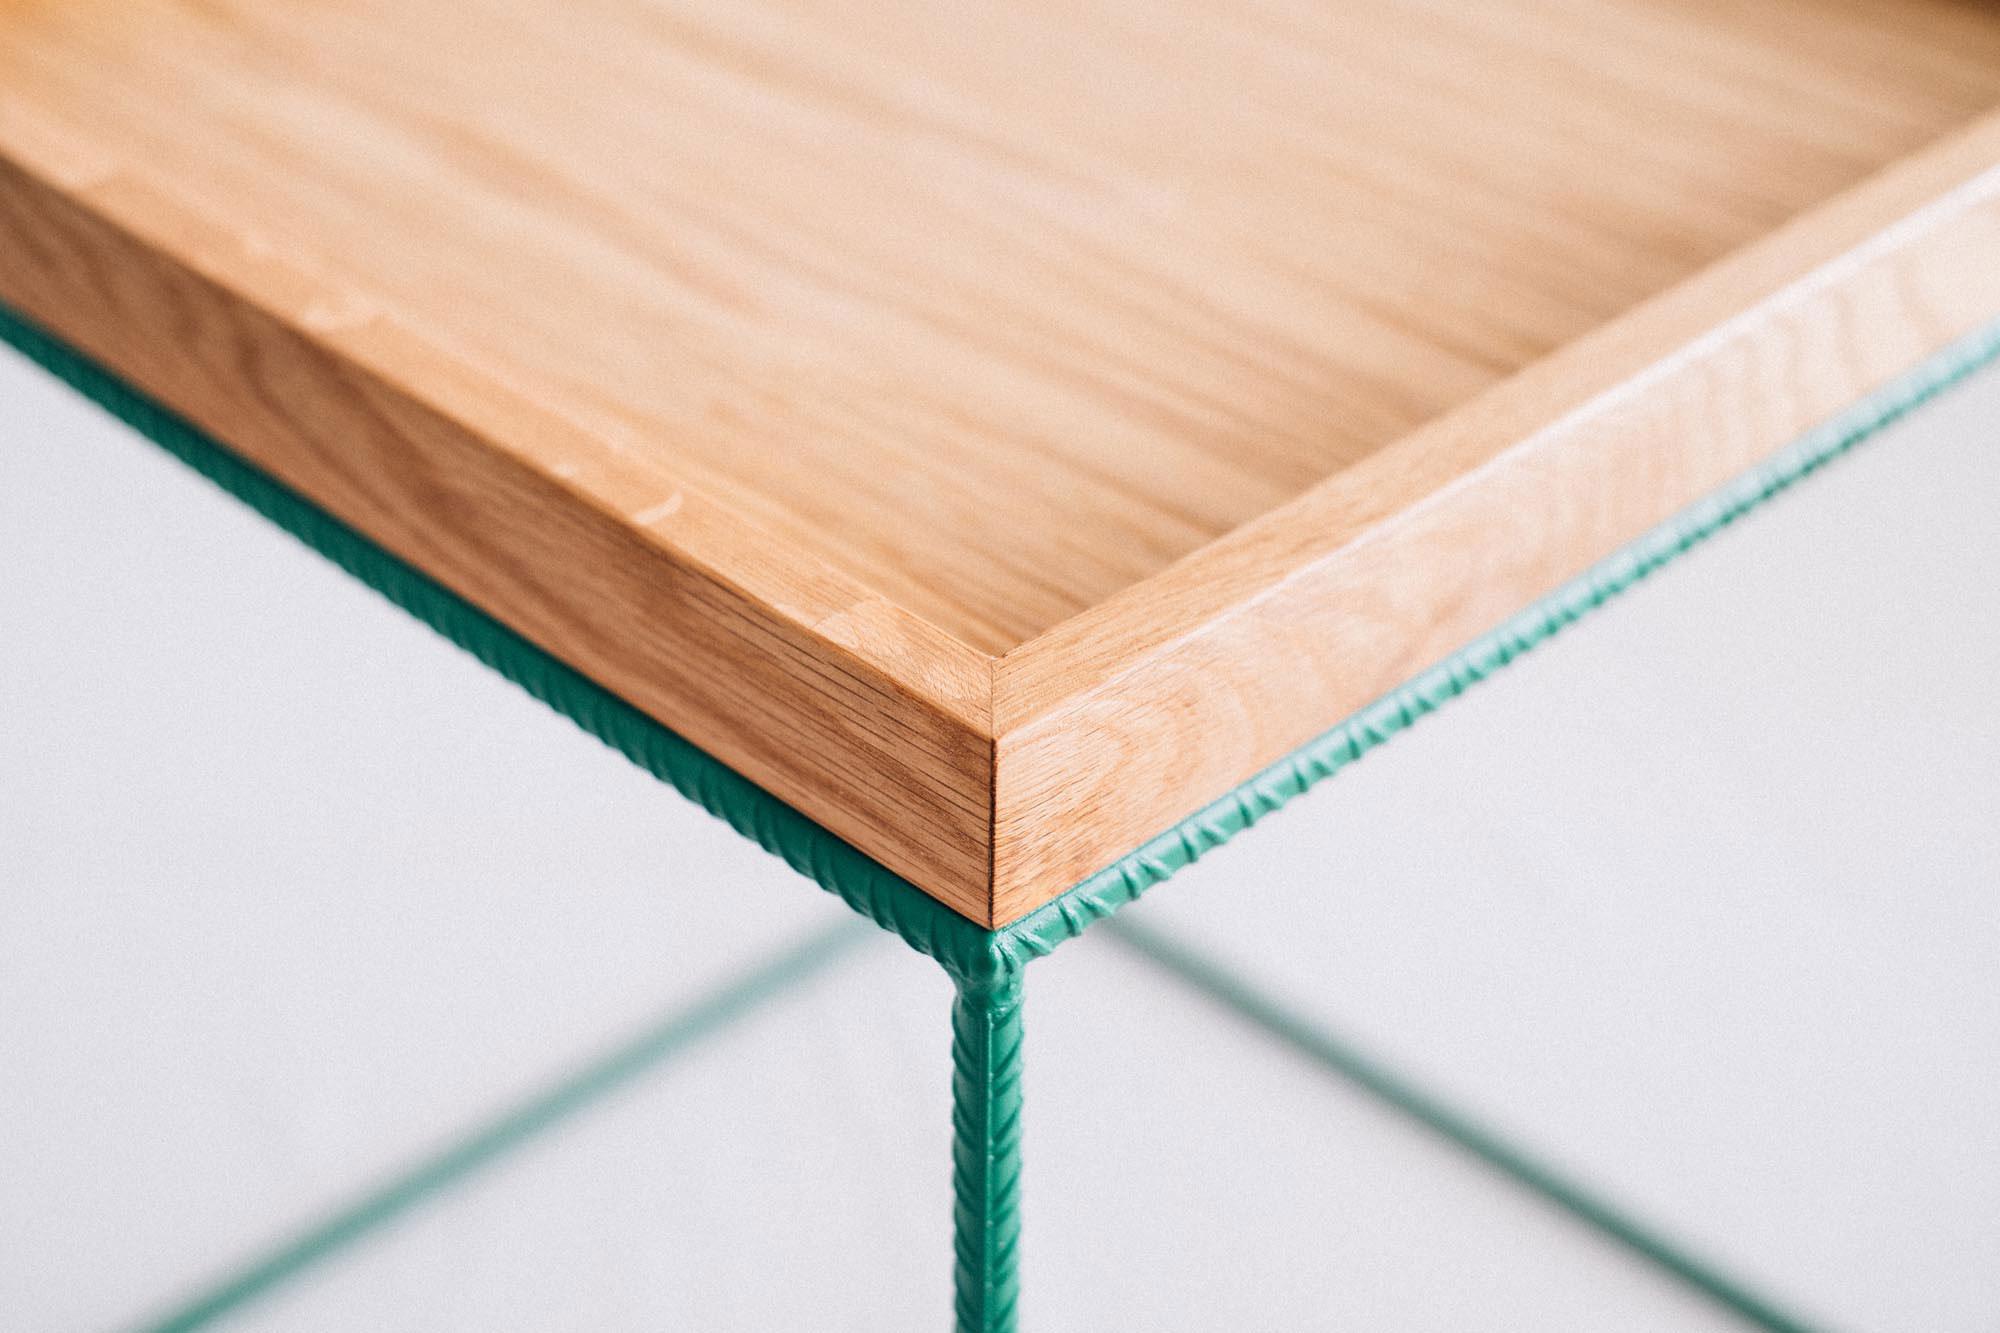 Artist Side Table